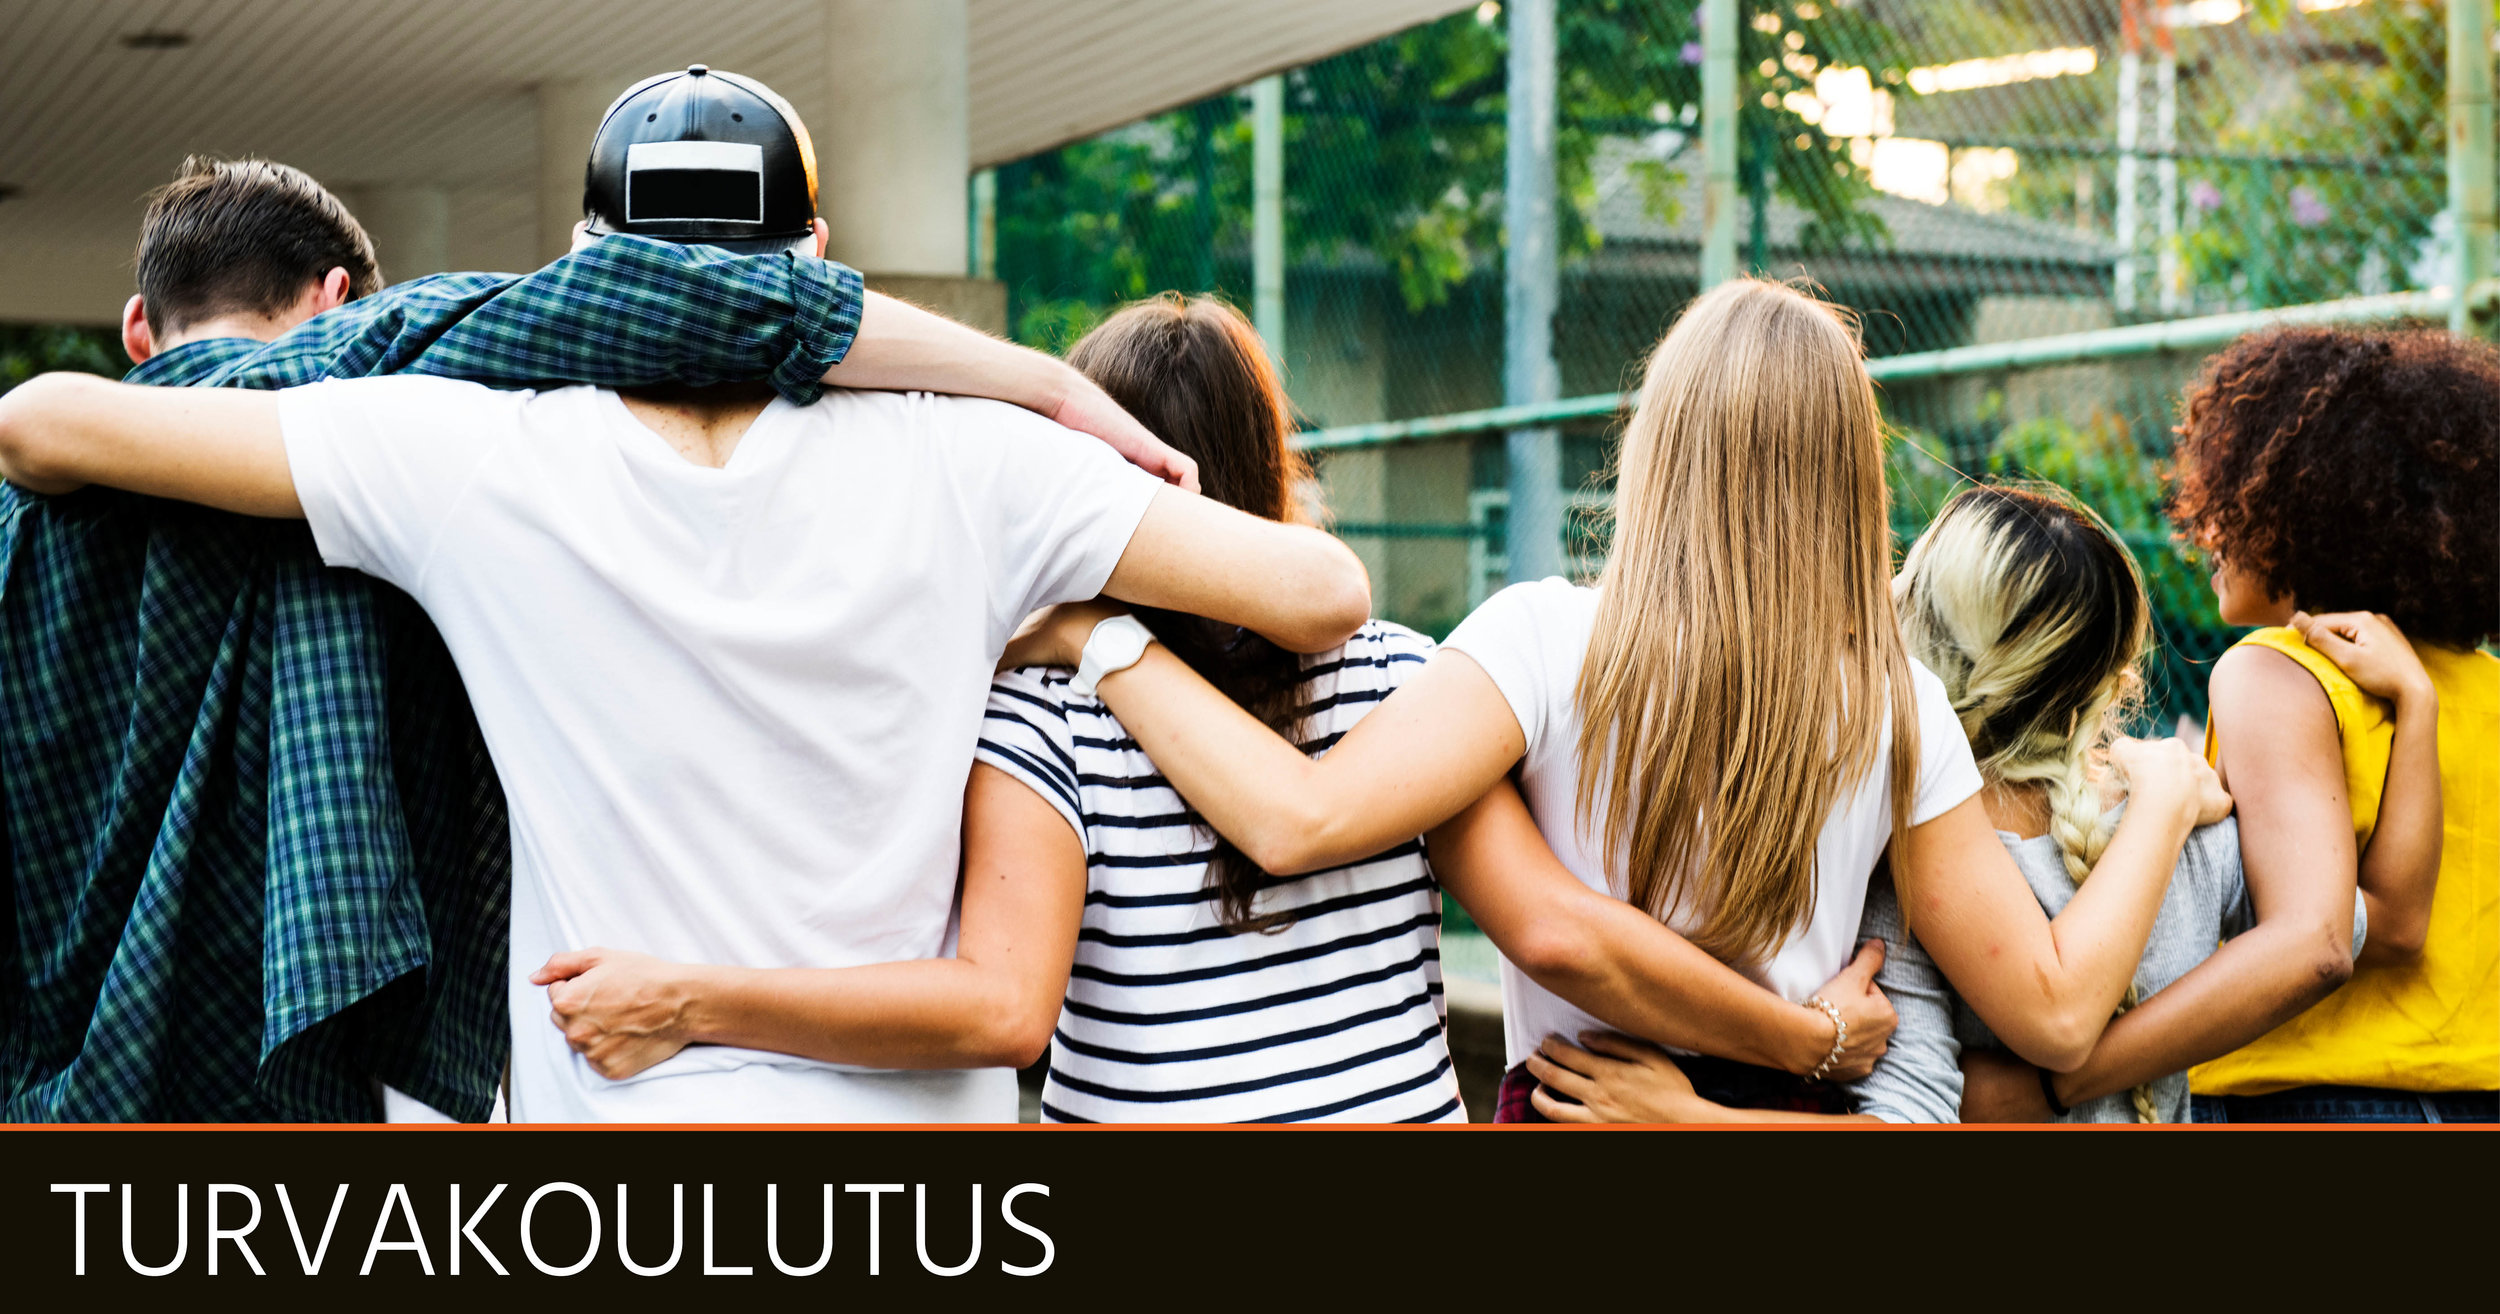 TURVAKOULUTUS_banneri.jpg